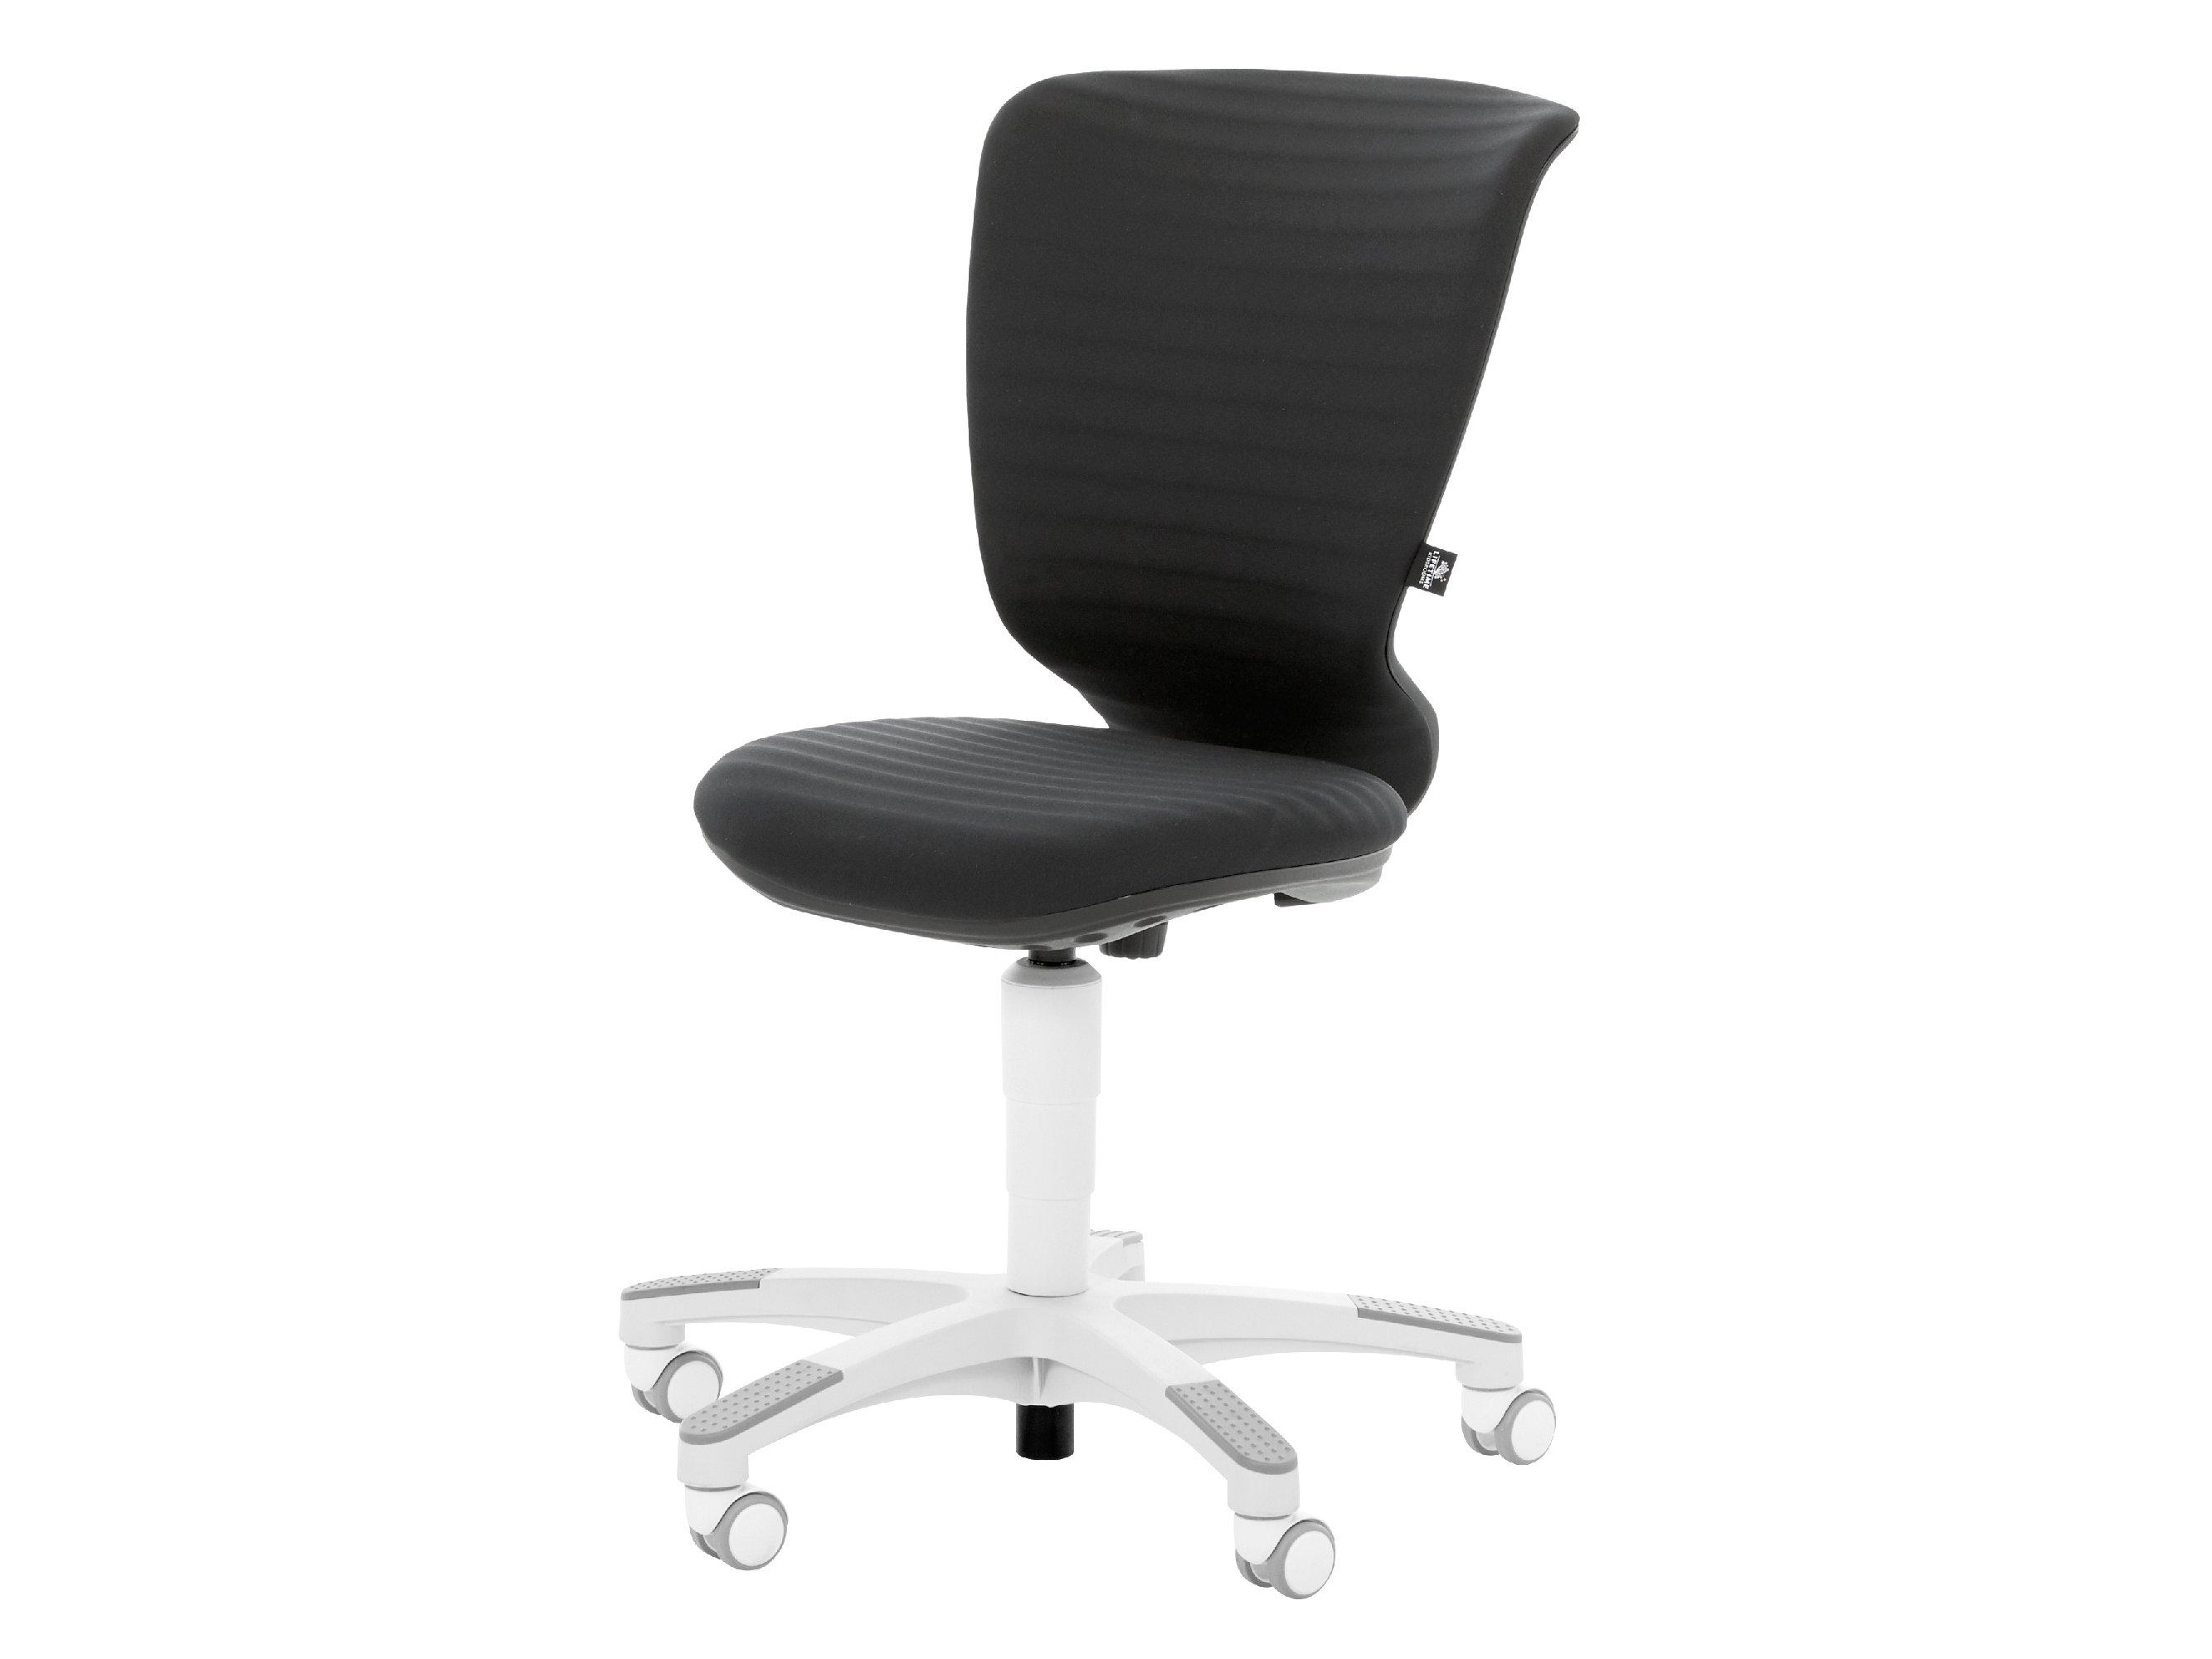 Kids Desk Chair Grey Desk chair, Chair, Grey chair